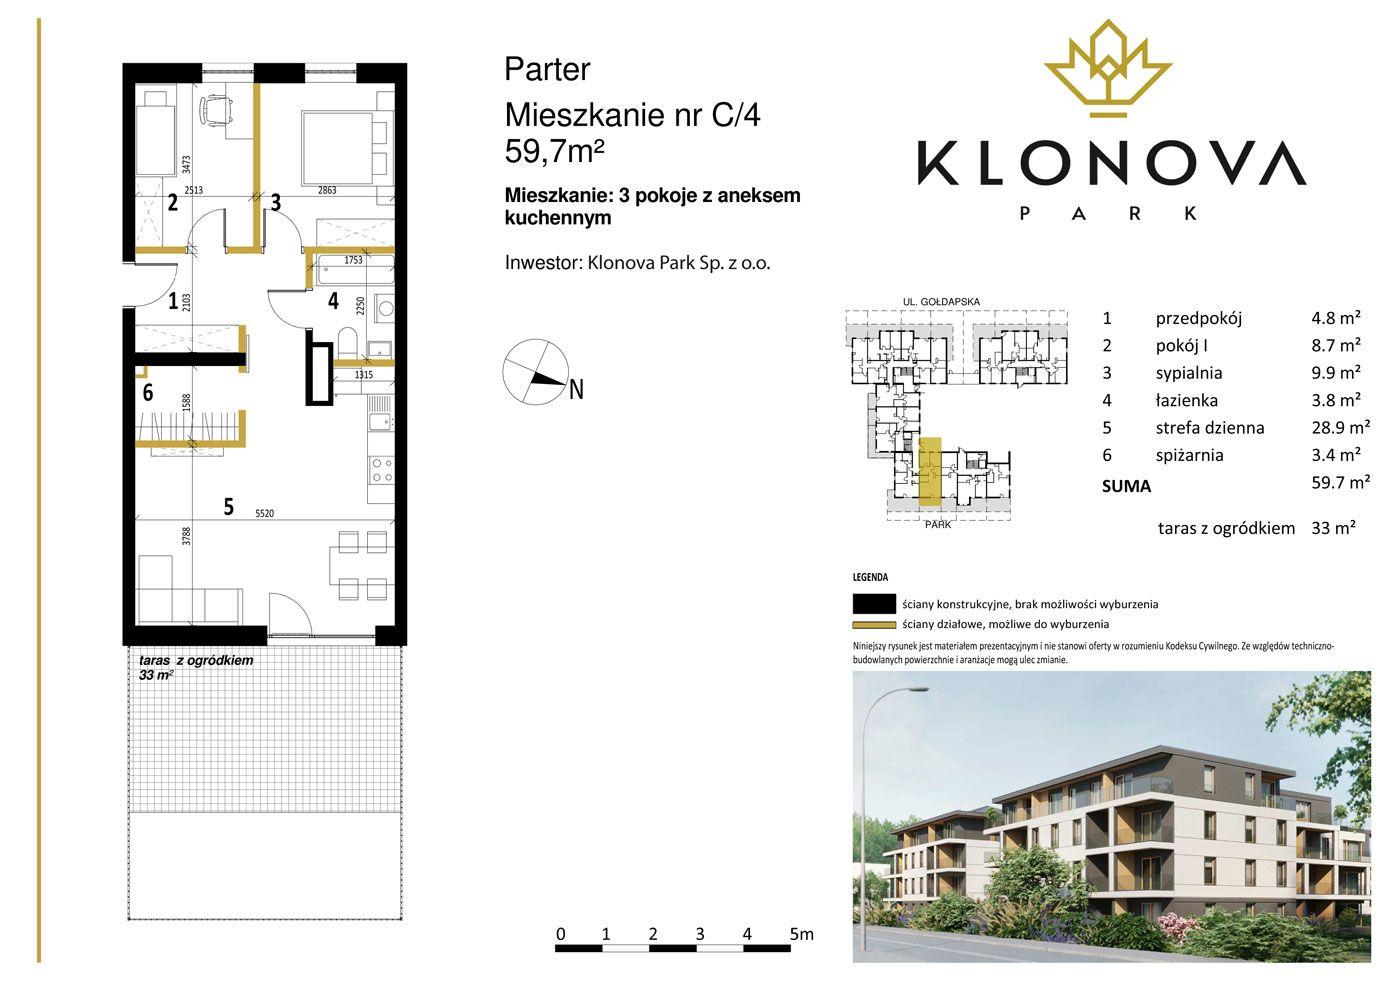 Apartamenty Klonova Park - Plan mieszkania C/4